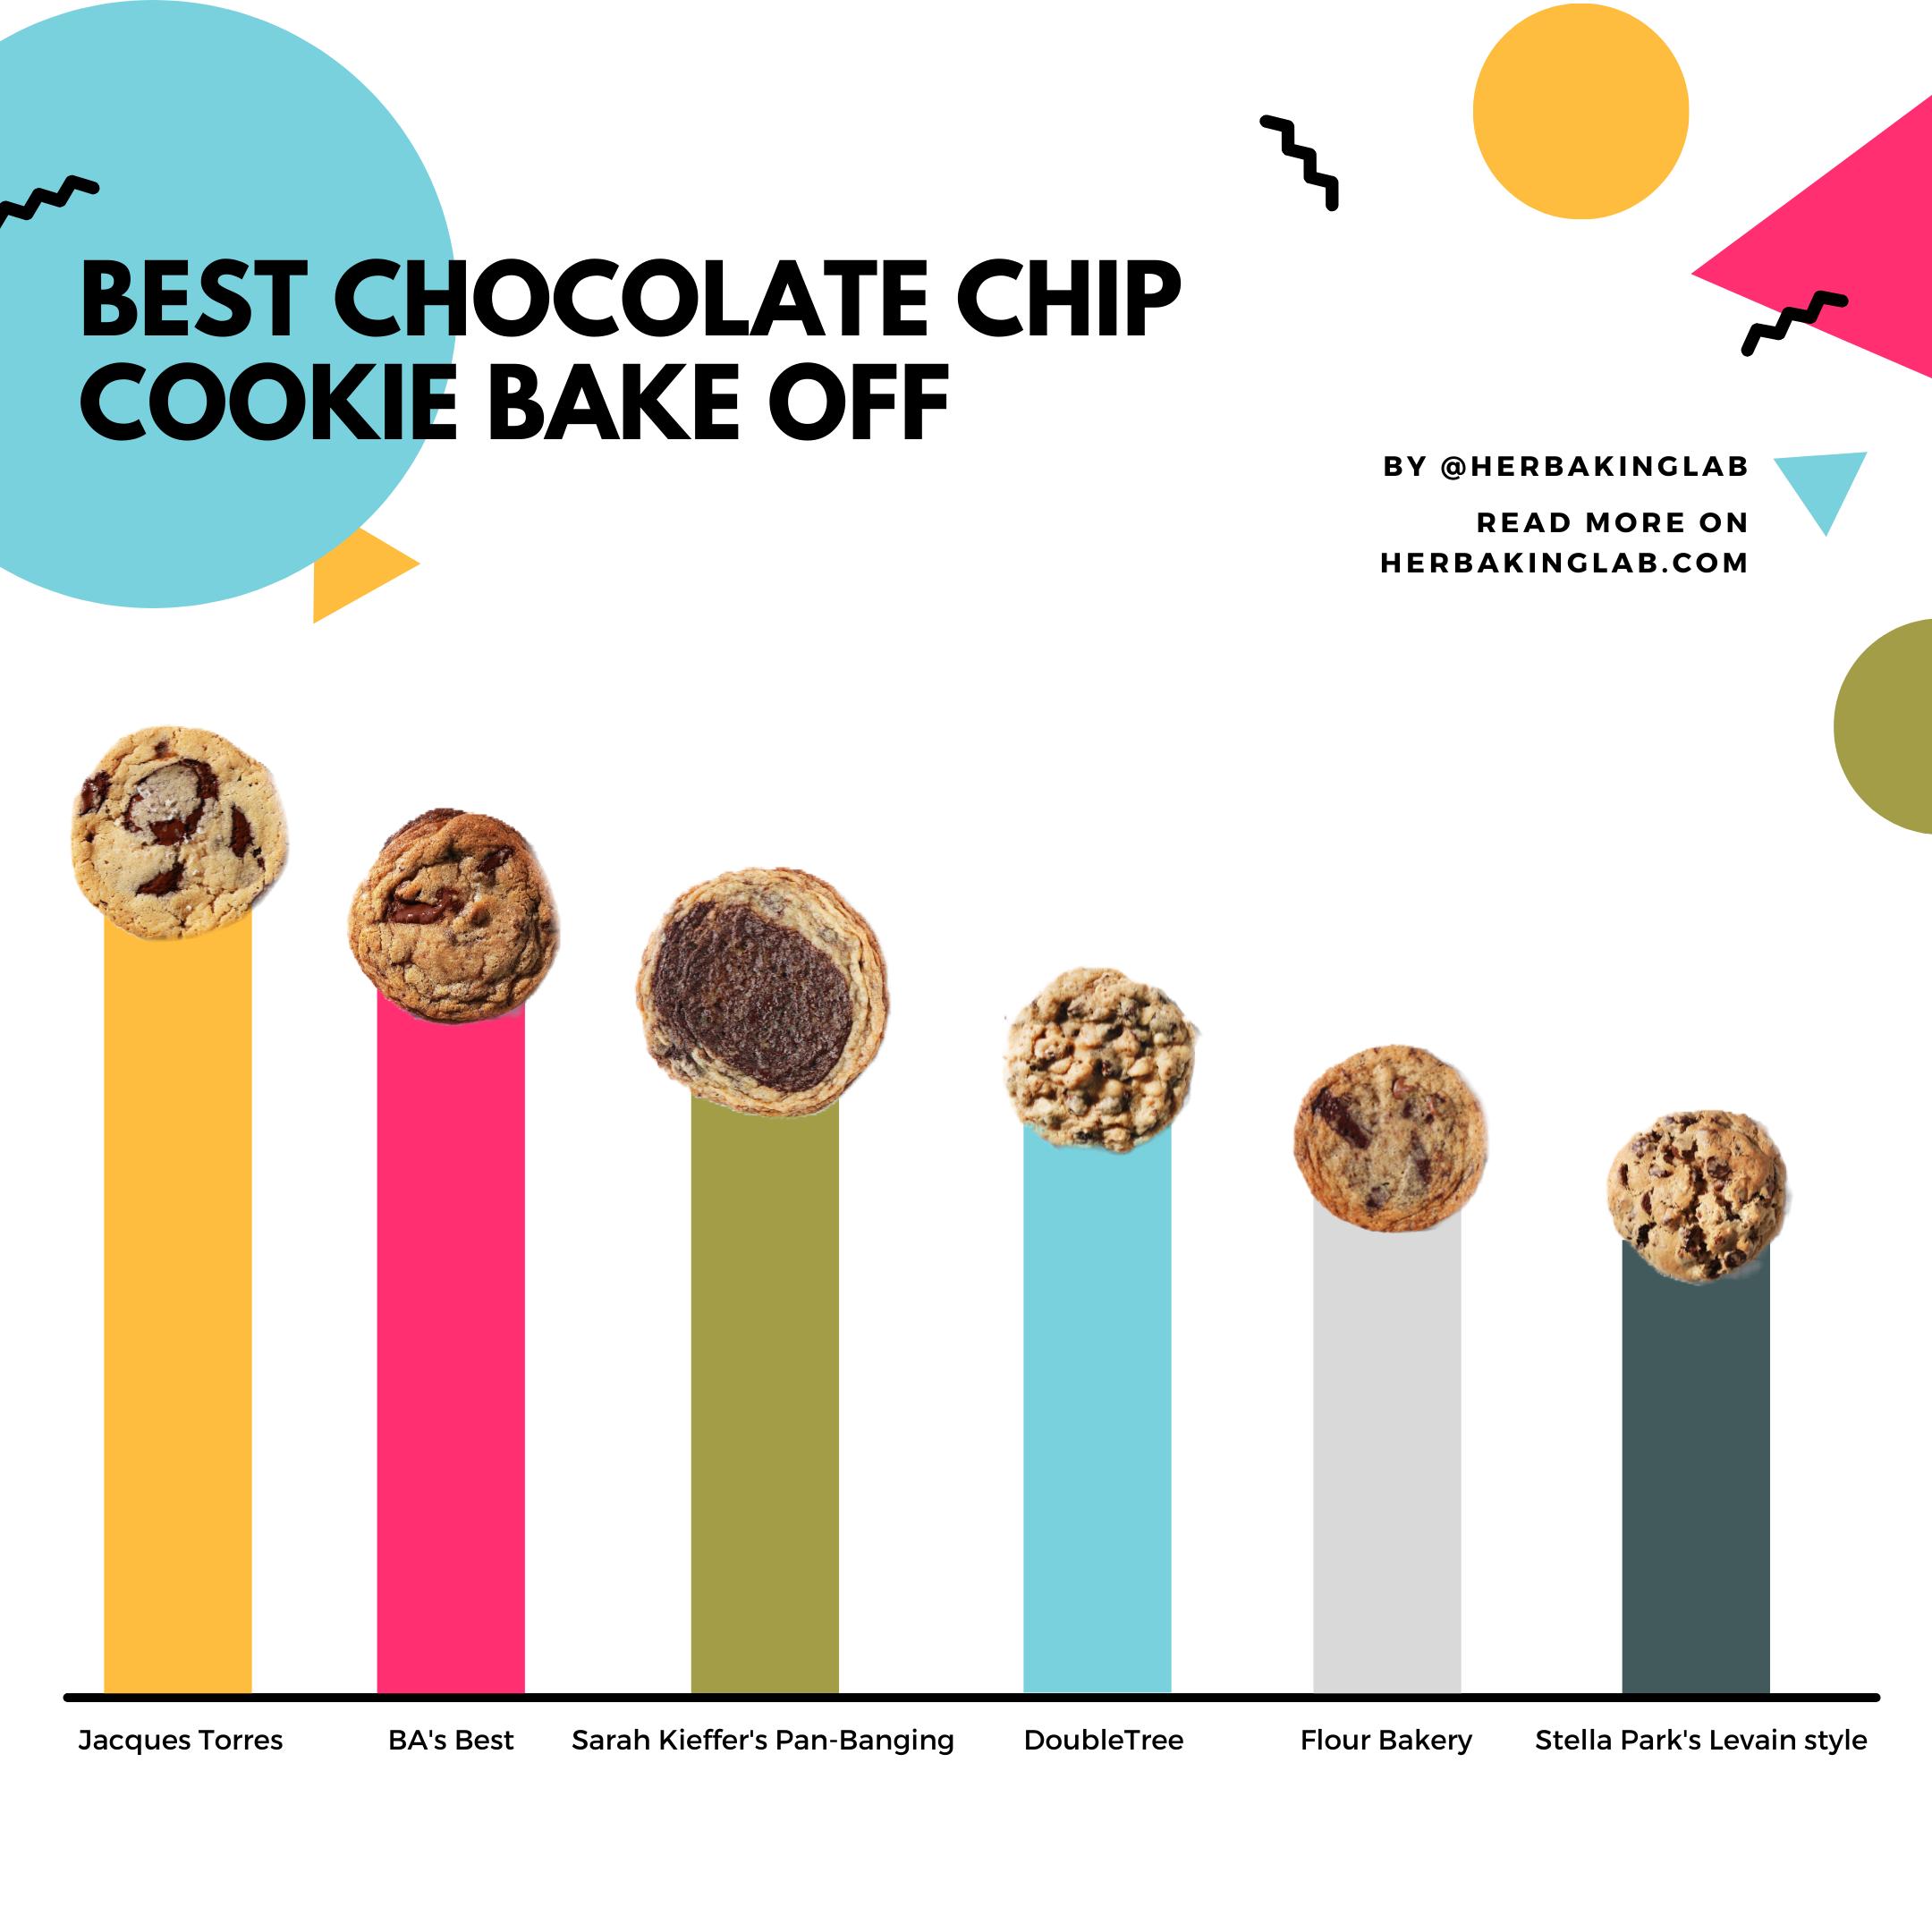 herbakinglab best chocolate chip cookie bake off ranking chart